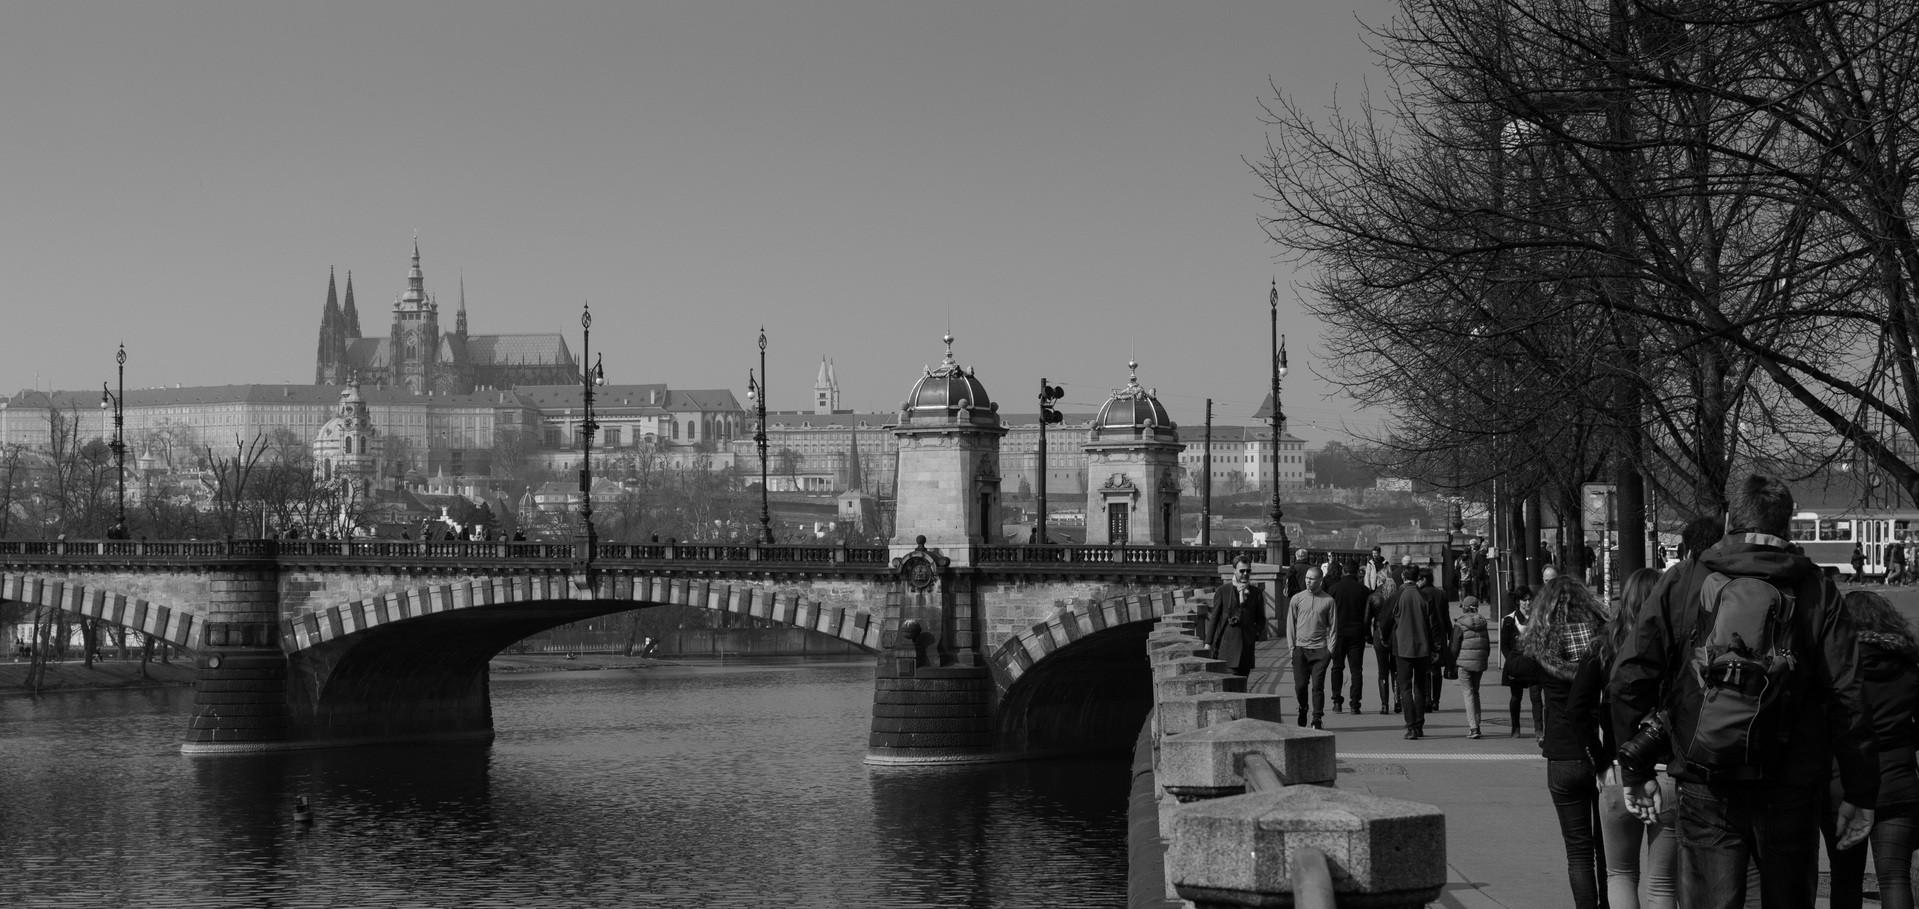 pedestrian-person-black-and-white-bridge-cit-canal-1327216-pxhere.com